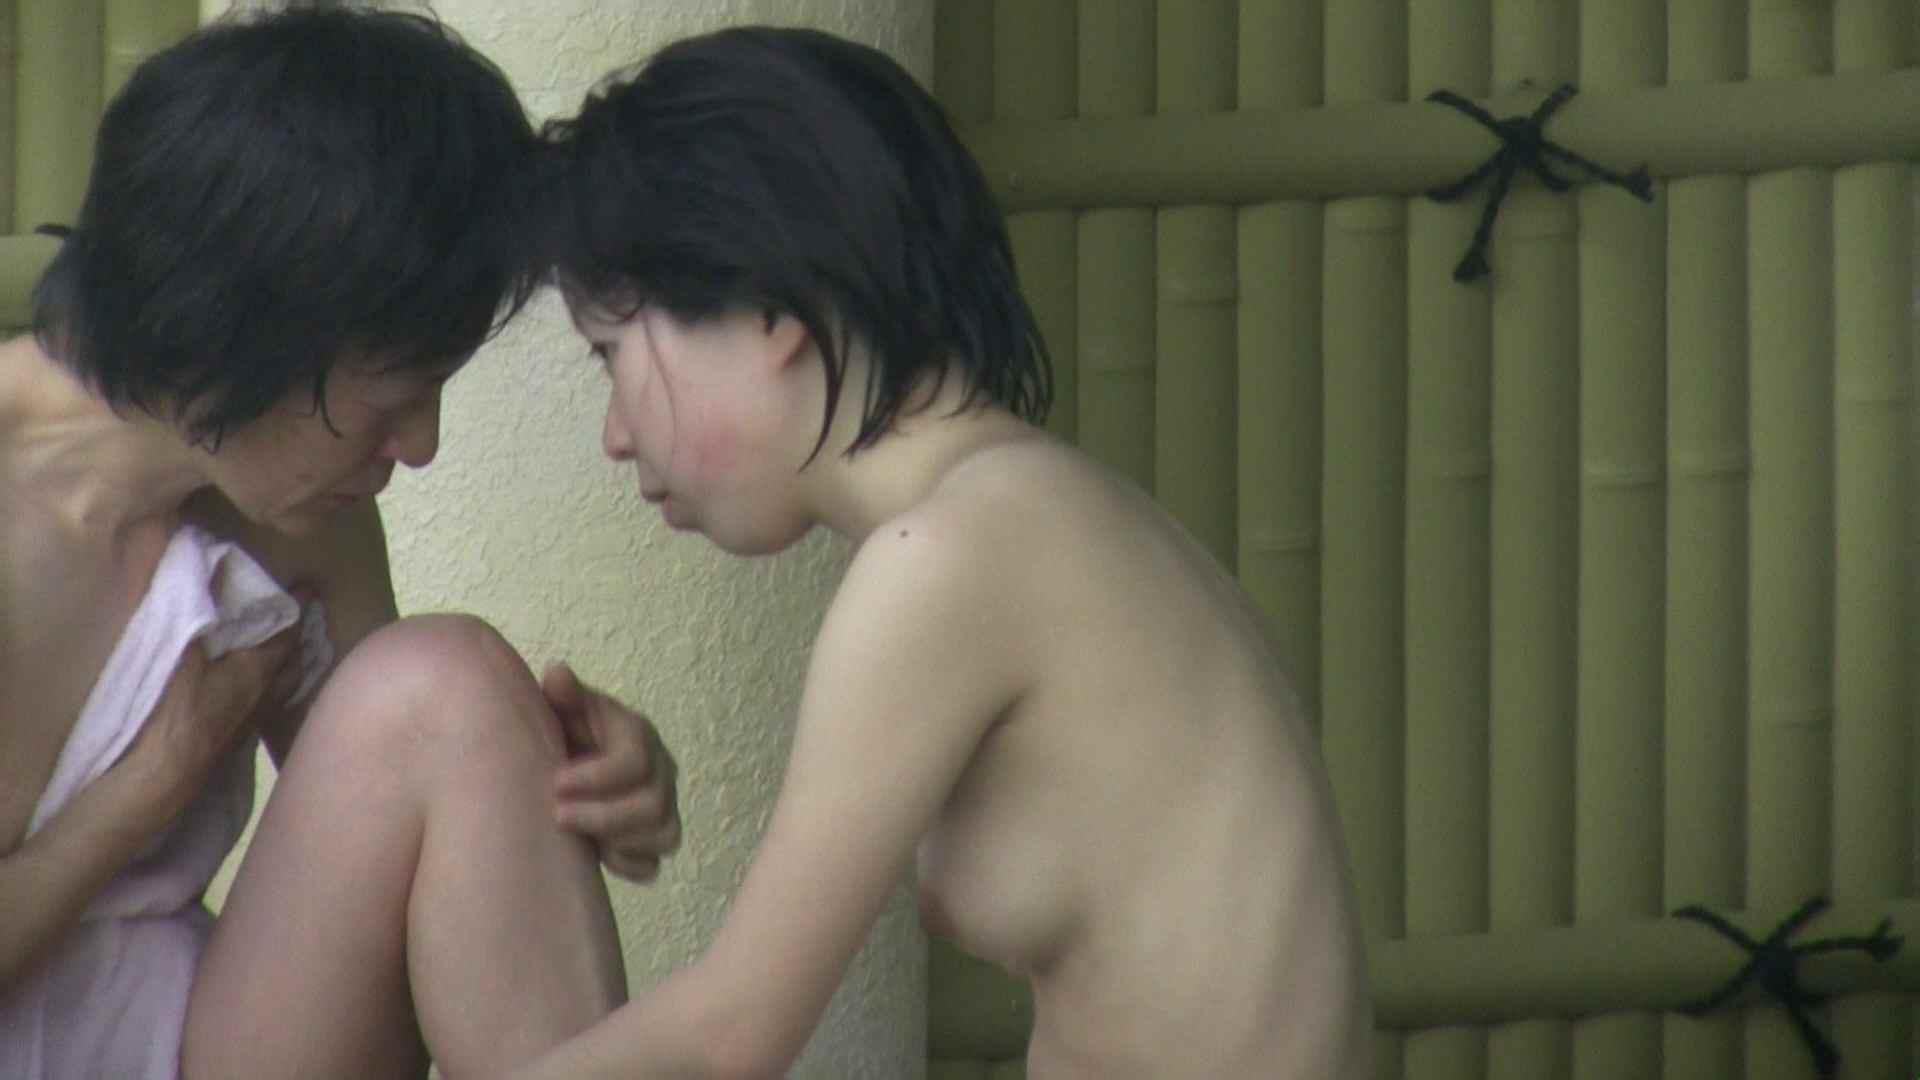 Aquaな露天風呂Vol.06【VIP】 HなOL | 盗撮  86pic 15